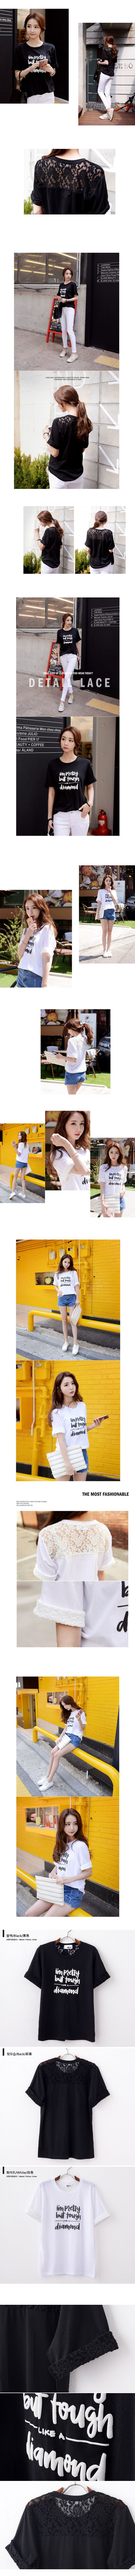 Korean Fashion Online Store 韓流 Trends Luxe Asian Women 韓国 Style Shop korean clothing Flower lace pattern Top